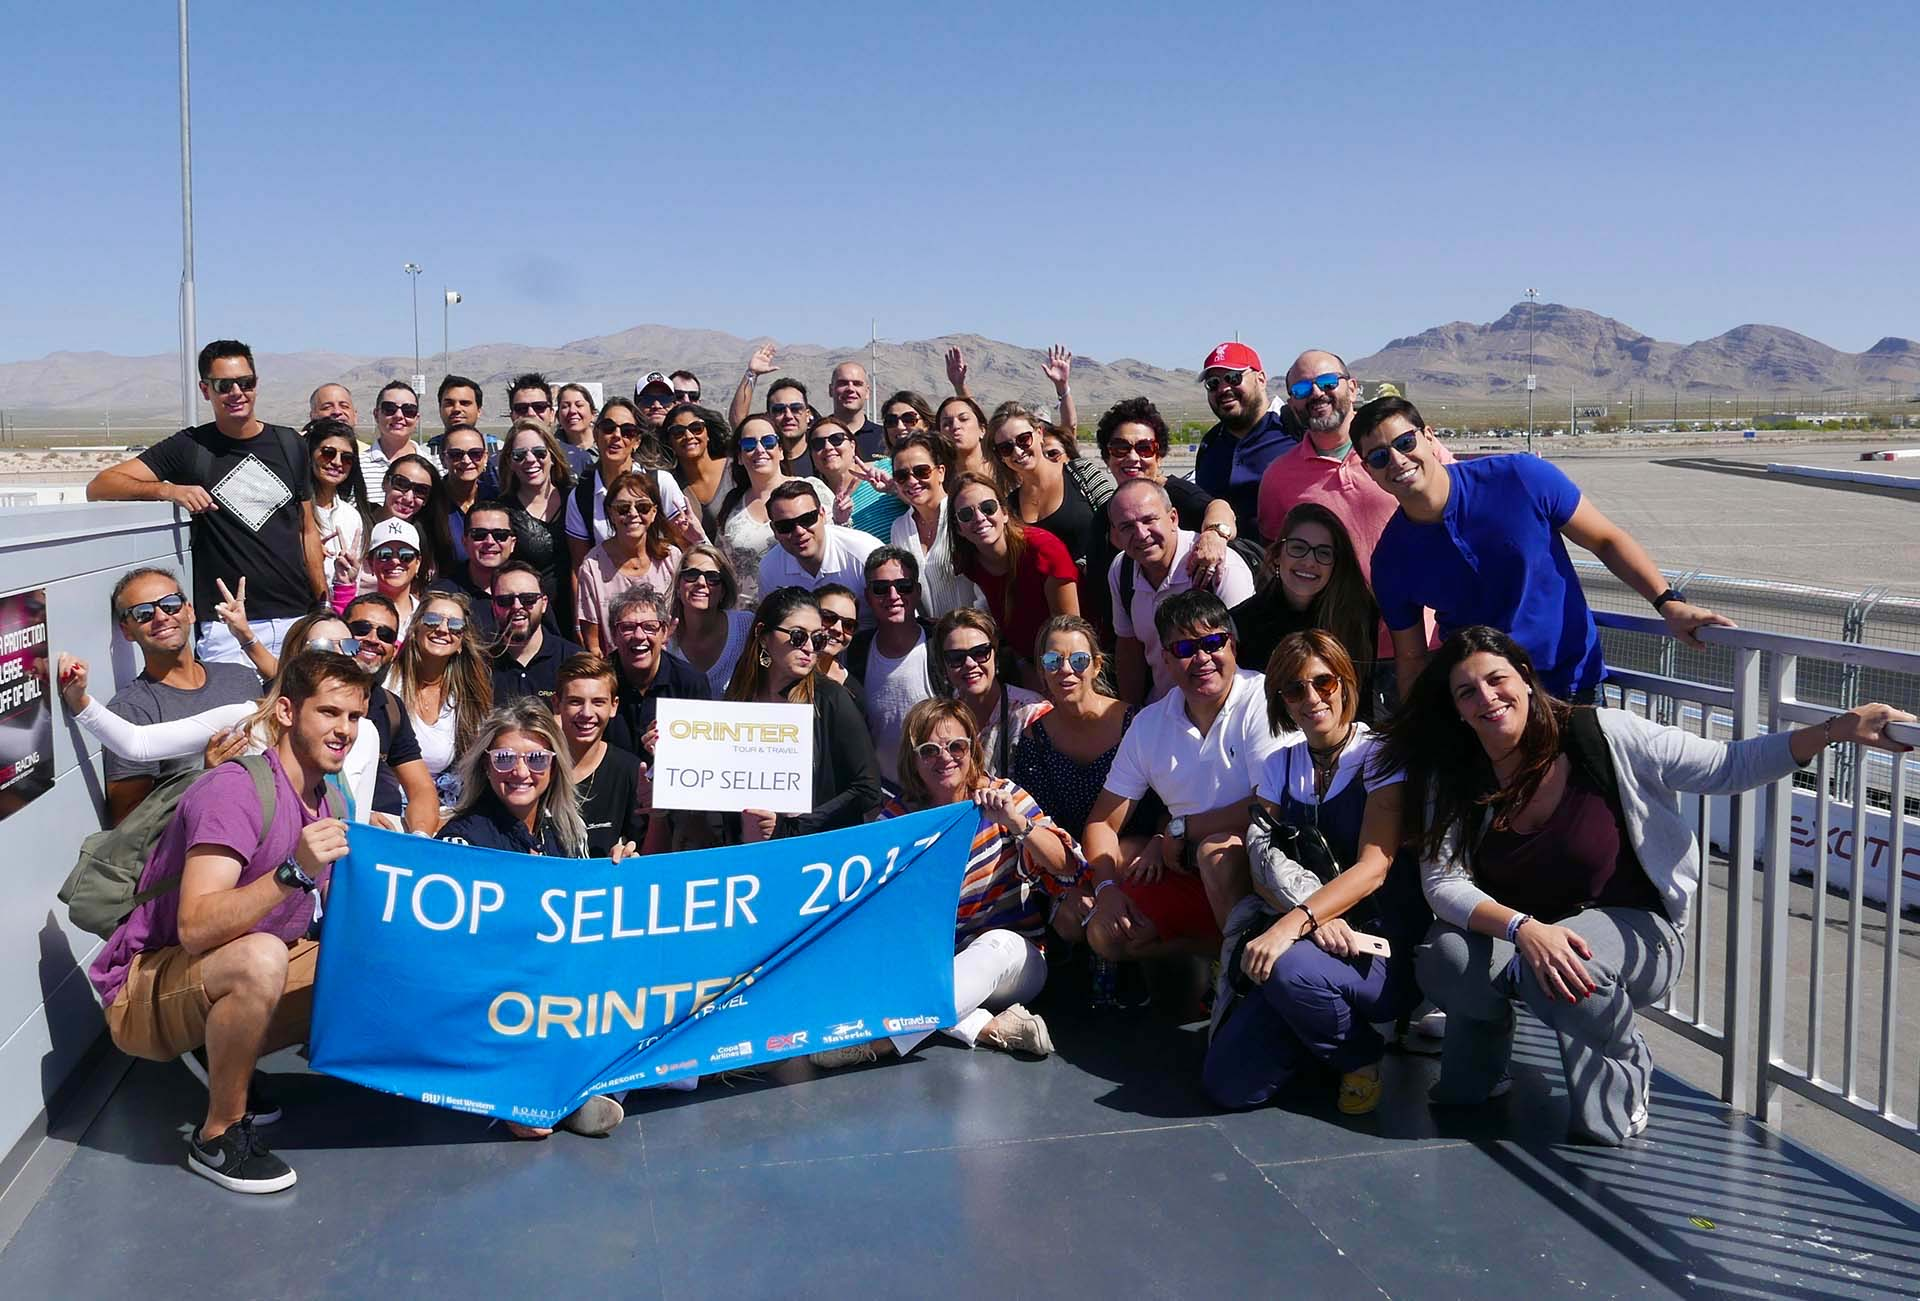 Top Seller Orinter